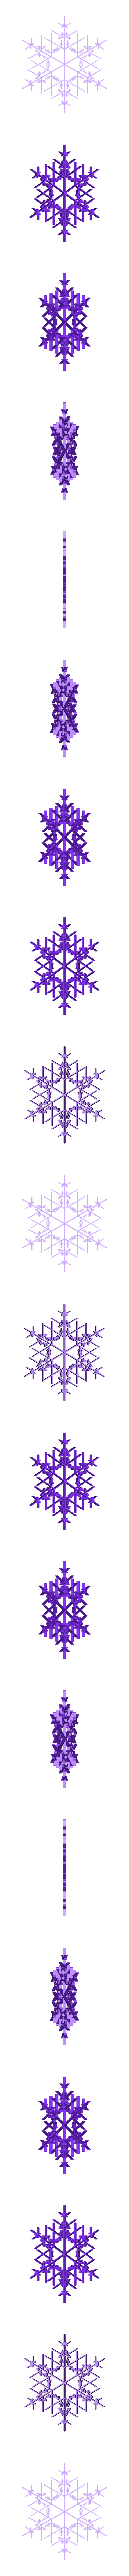 snowflake11.stl Download free STL file Random fractal snowflake in BlocksCAD • 3D printer model, arpruss